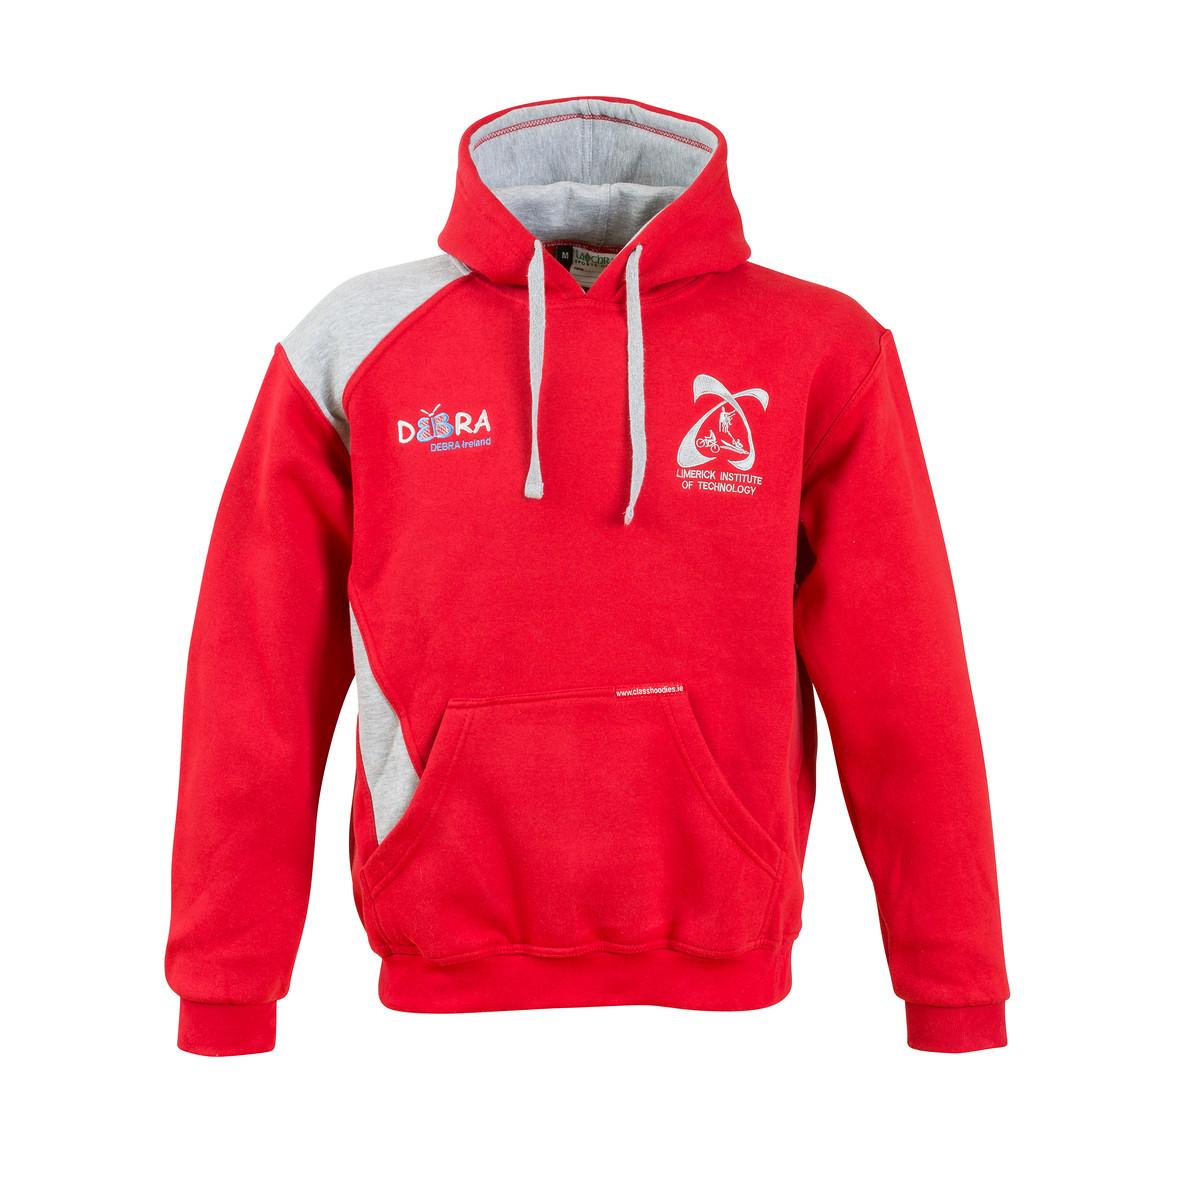 Class hoodies